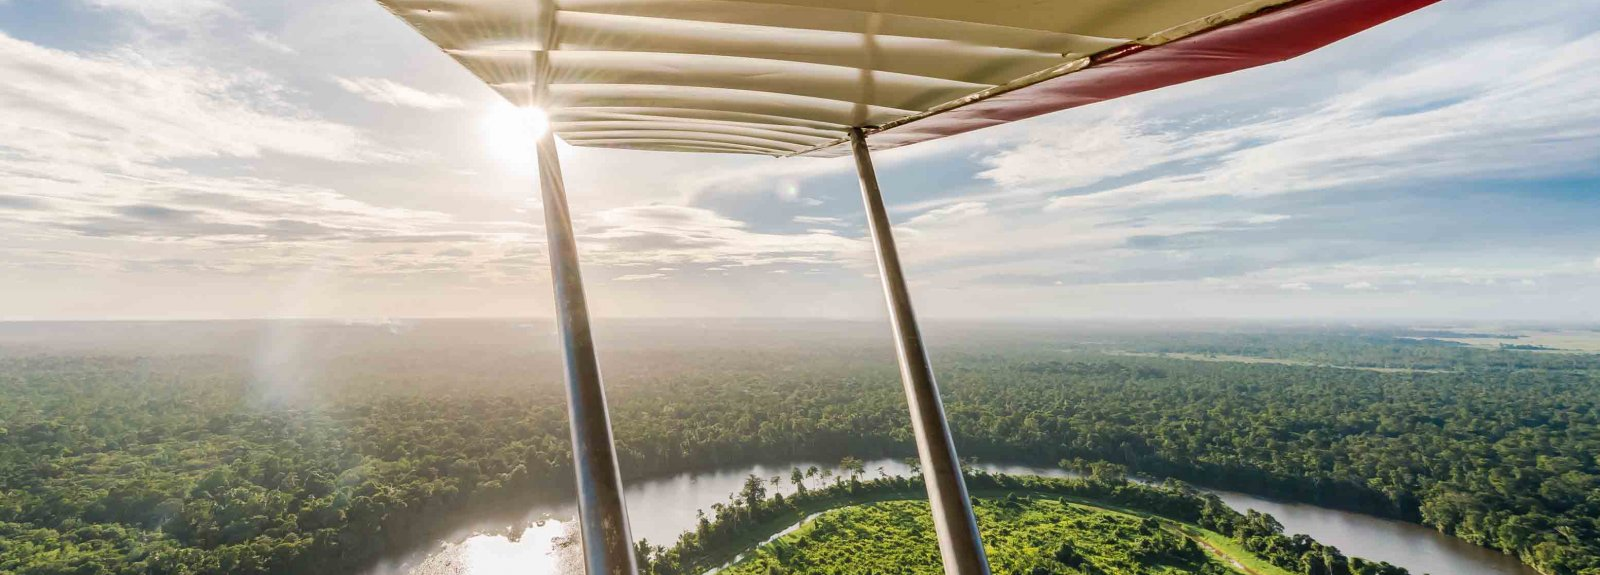 Guyane vue du ciel à Mana